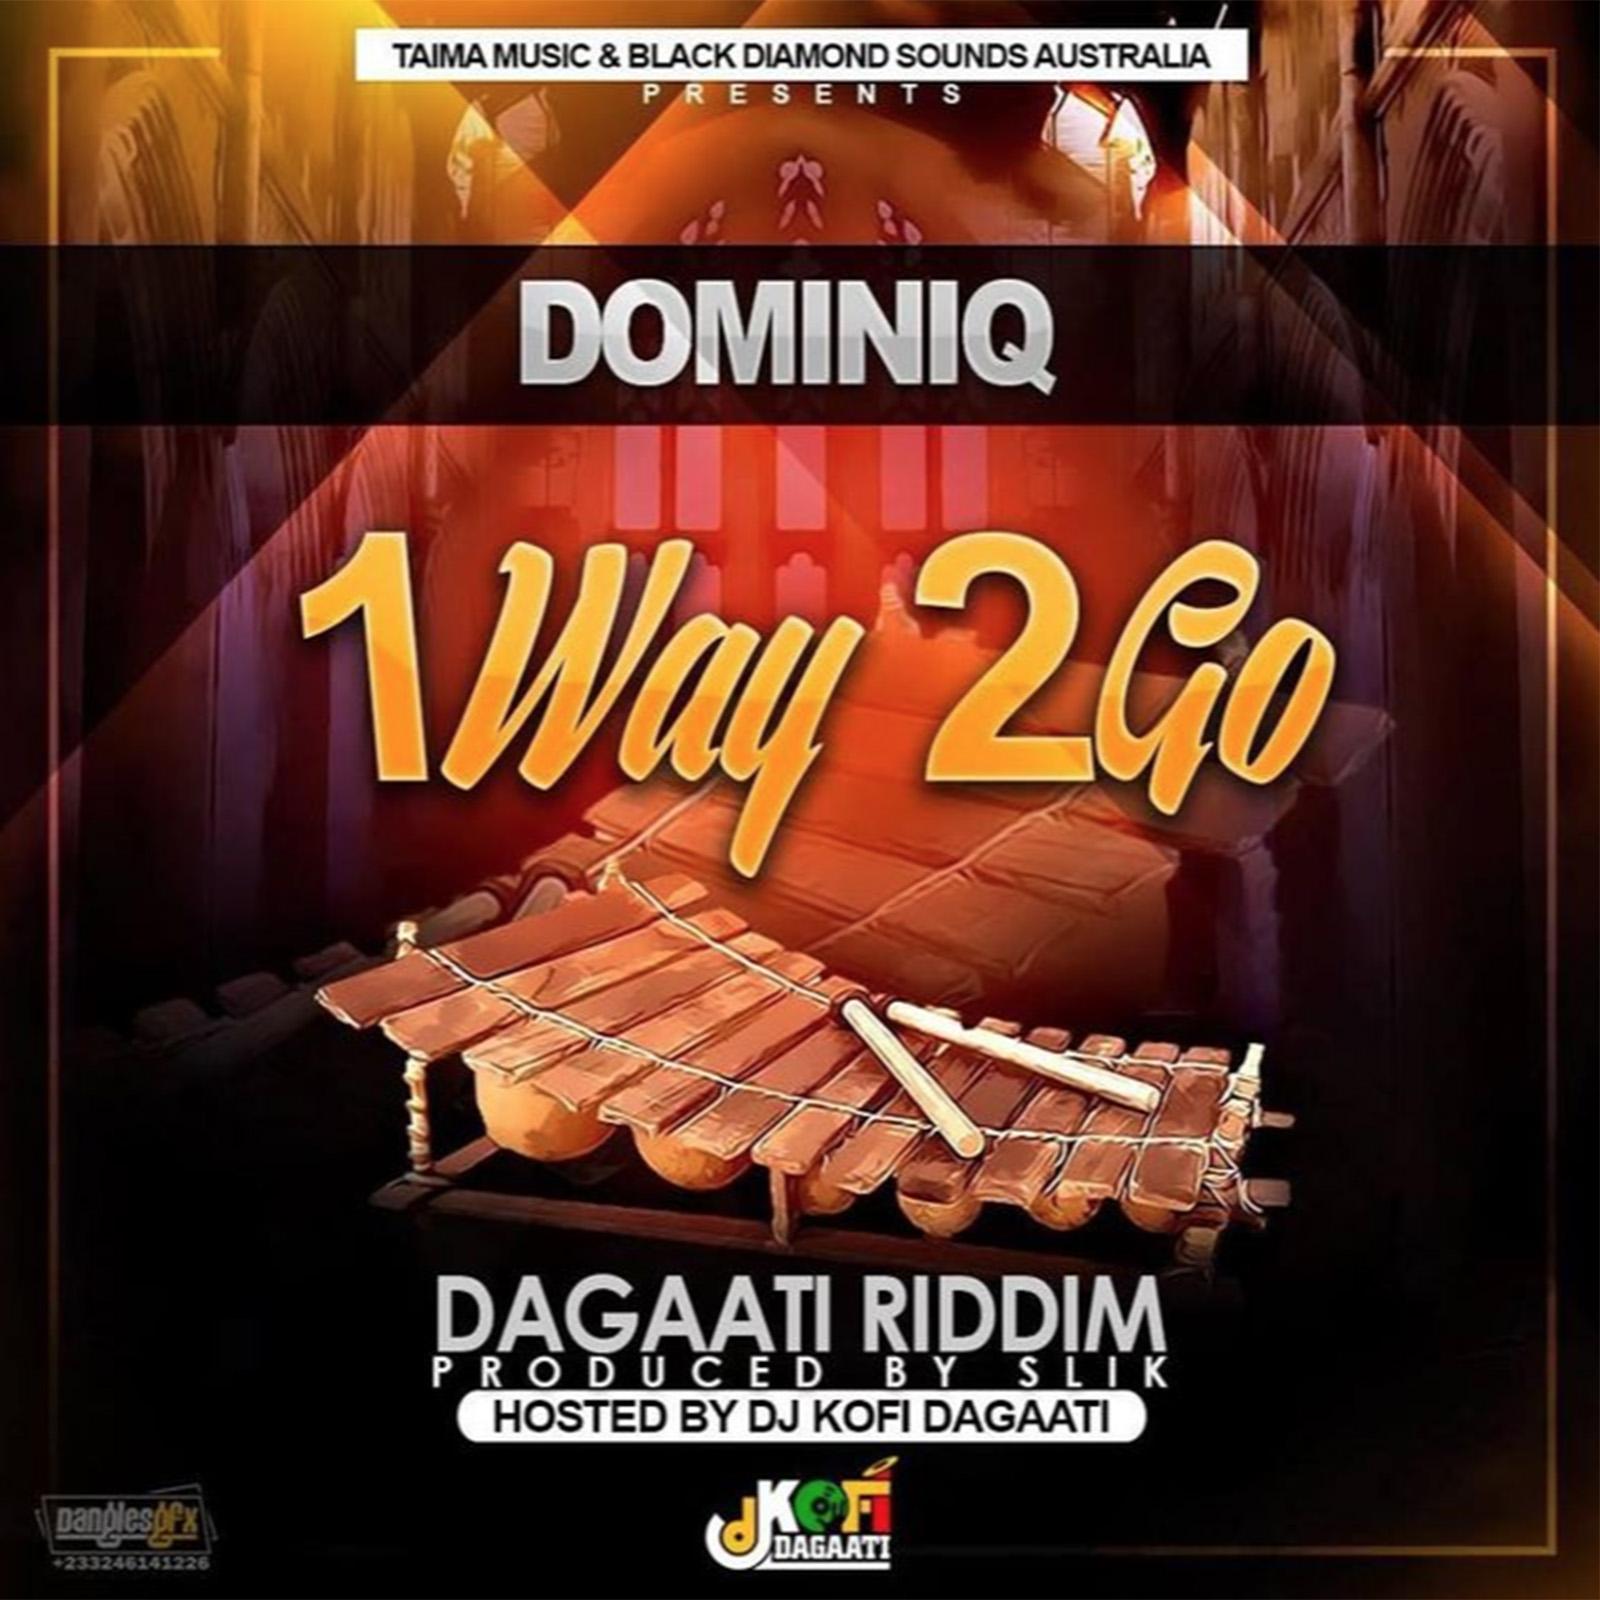 1Way 2Go (Dagaati Riddim) by Dominiq